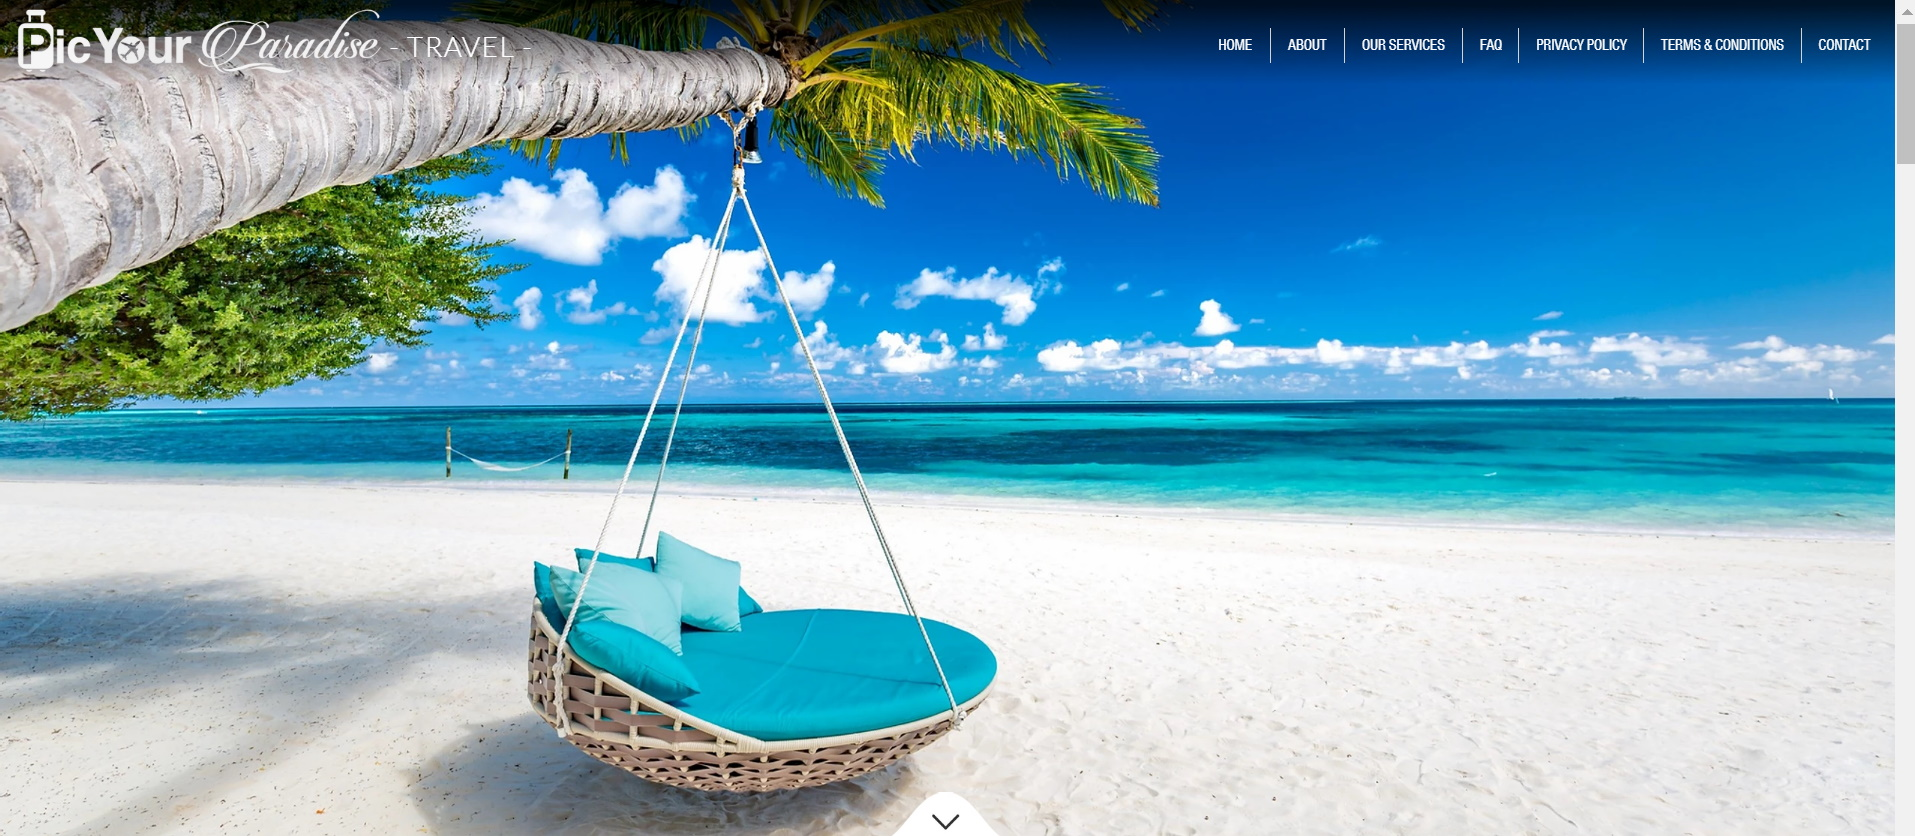 PIC YOUR PARADISE TRAVEL Classic Travel Database Website Design.